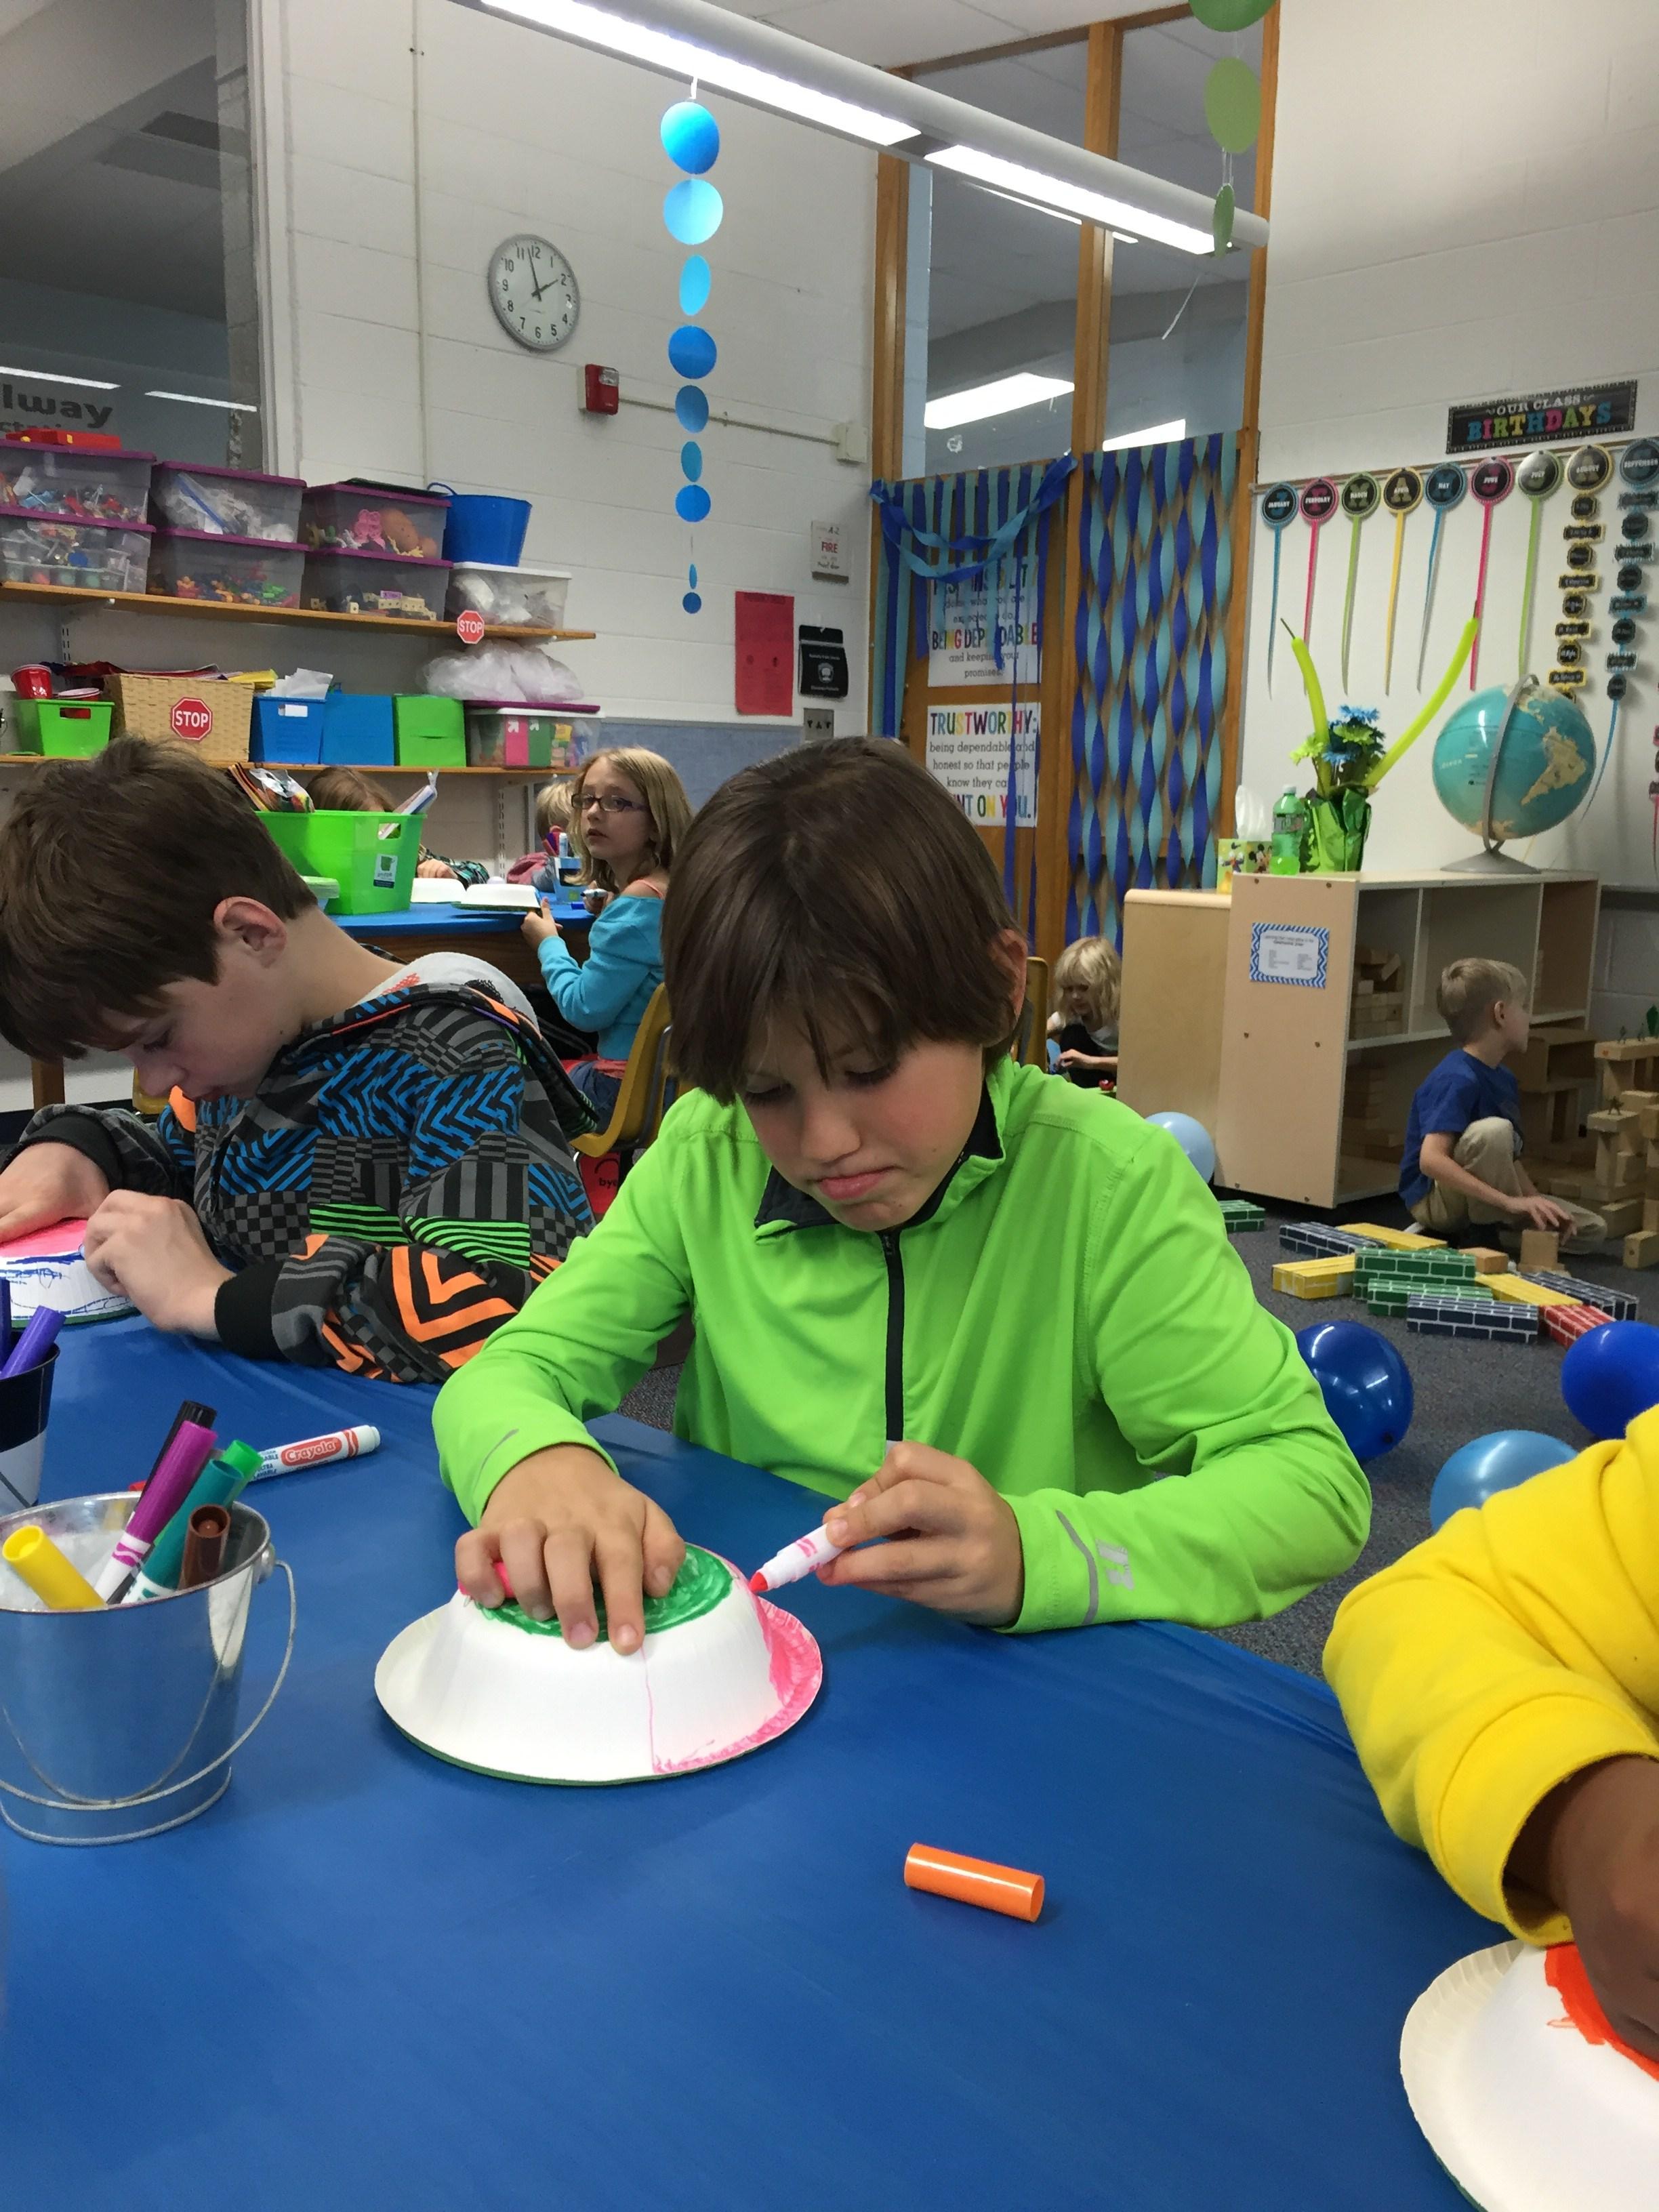 Boy painting a bowl.